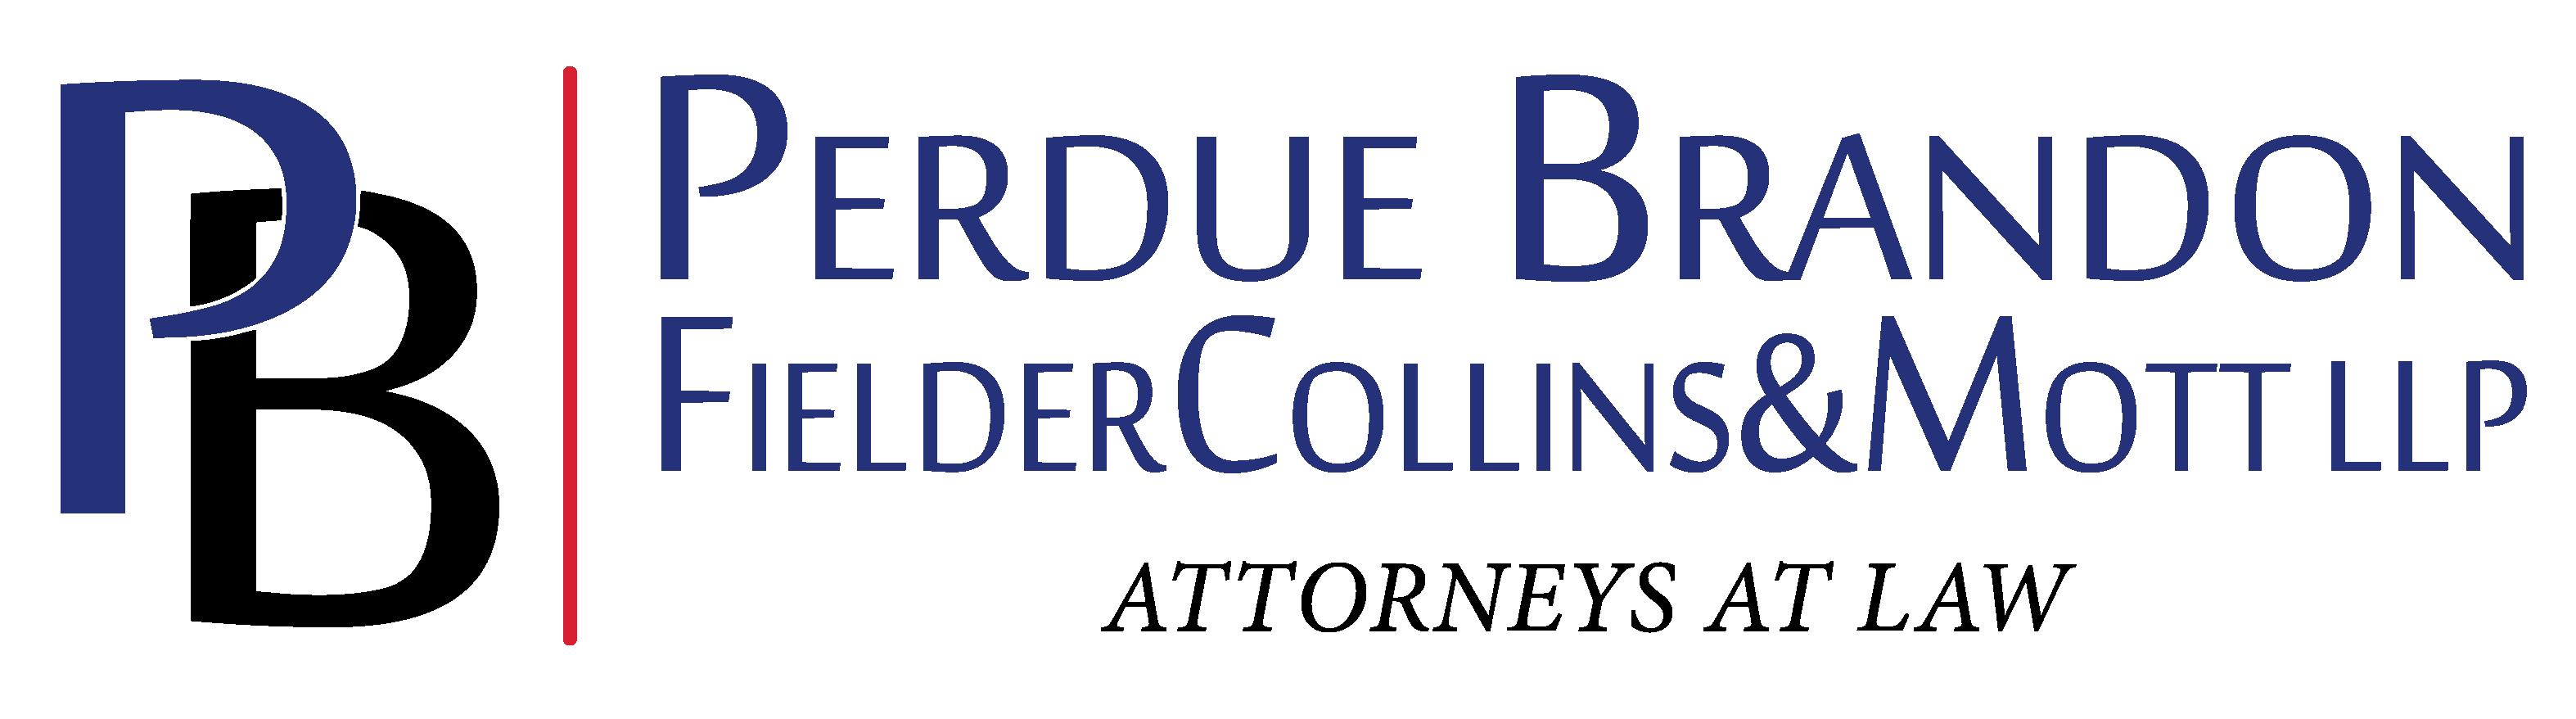 Perdue Brandon Tax Foreclosure Sale Map Disclaimer